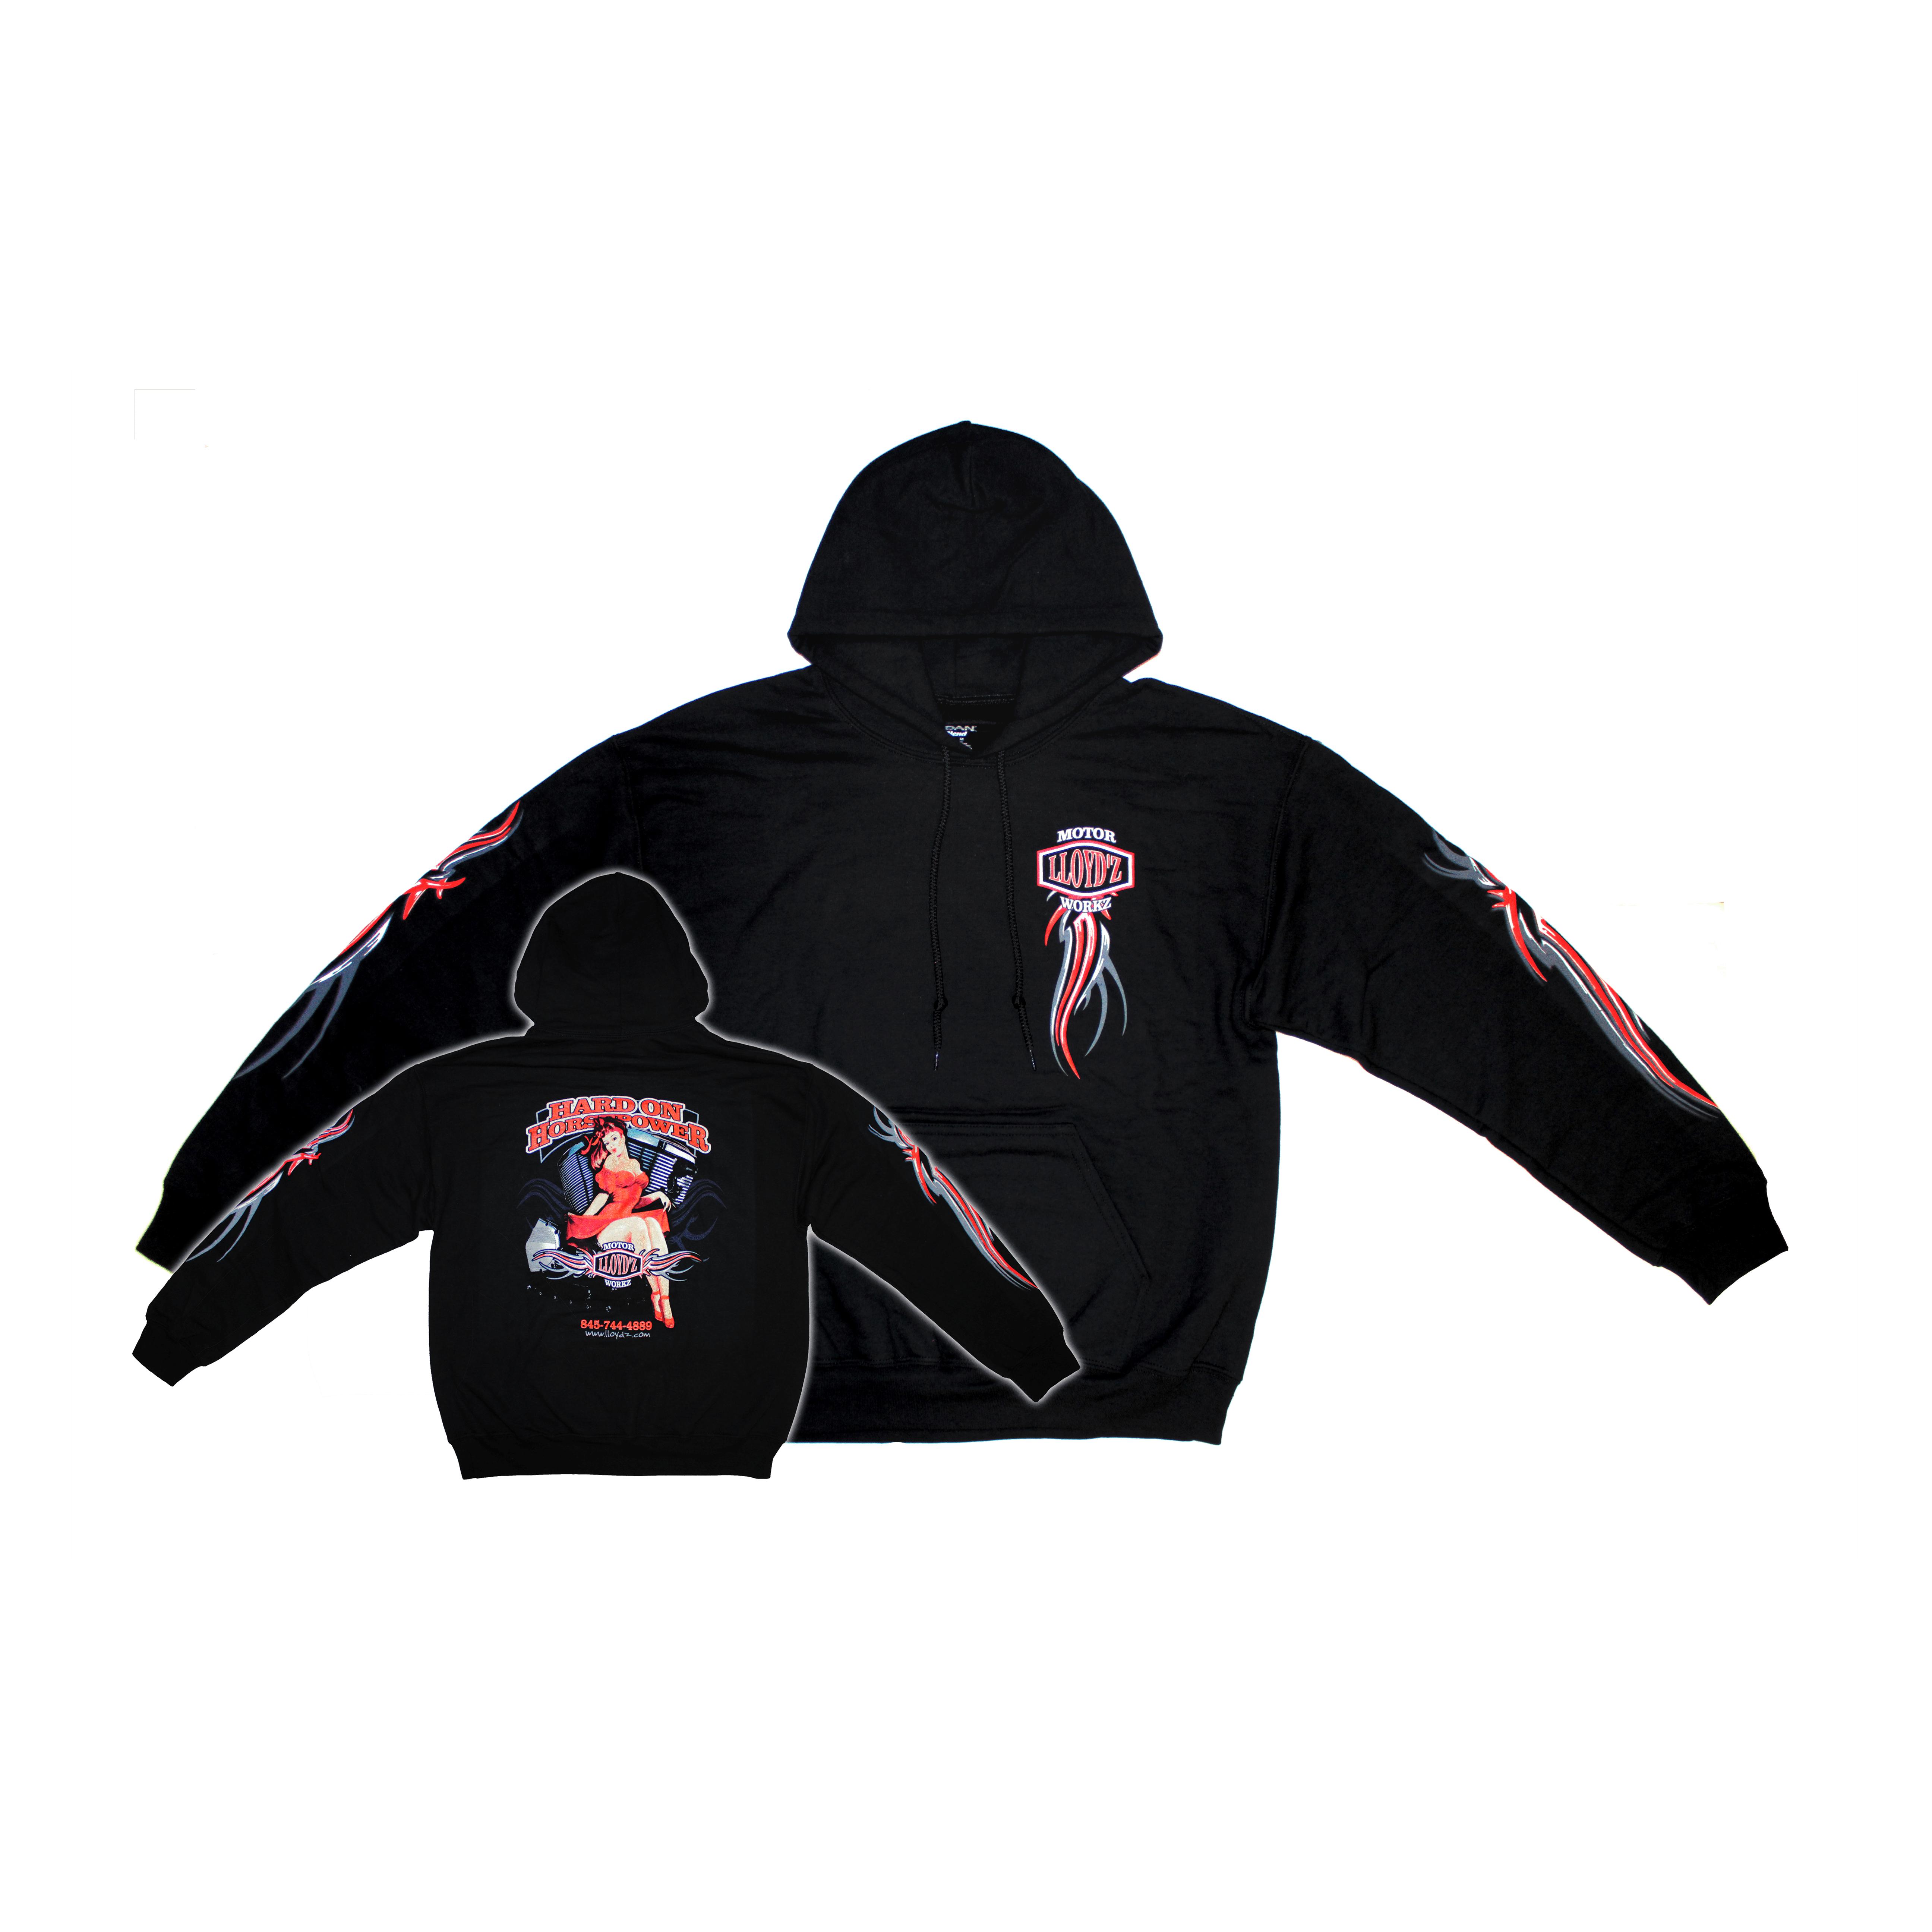 LLOYD'Z Pin-Up Girl Hooded Sweatshirt